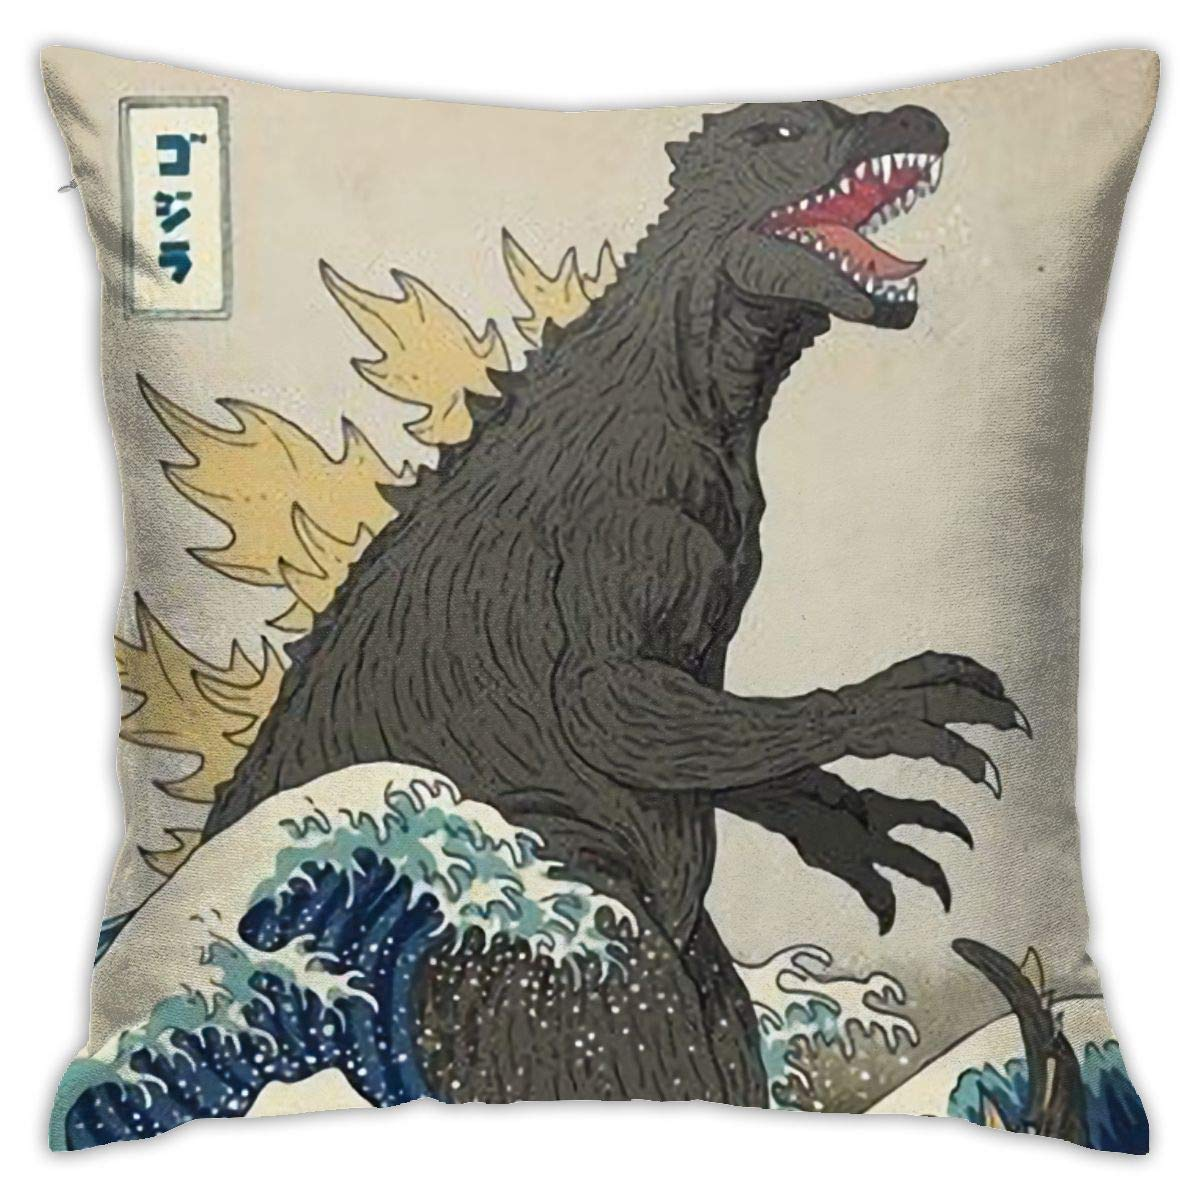 Bedding Soft and Comfortable Sleep Pillowcase Quality Gift Green Deer The Great Godzilla Off Kanagawa Funny Pillowcase Invisible Zipper